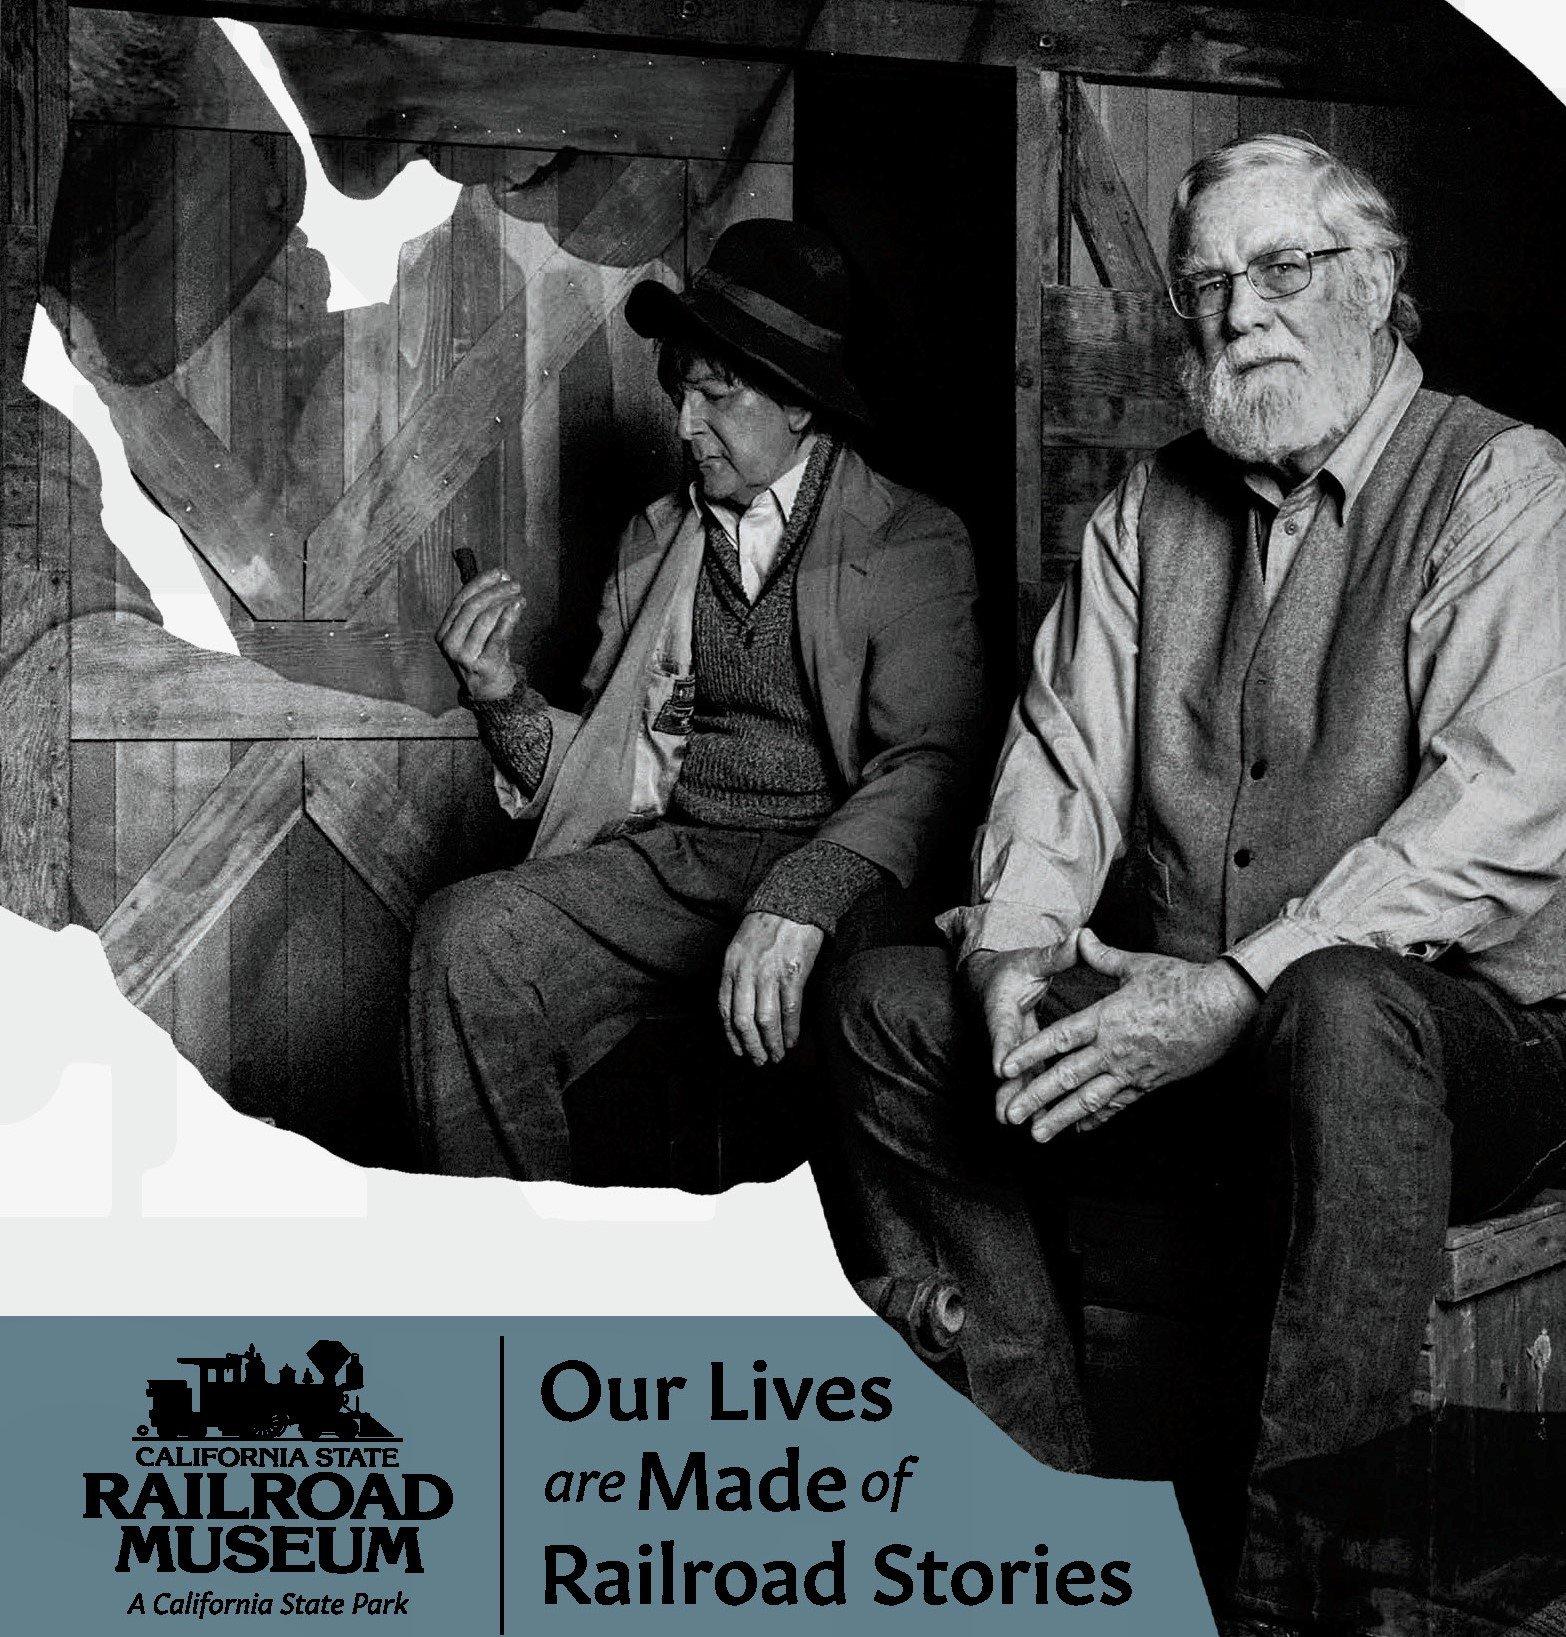 Railroad Museum Calls Out for Your Railroad Stories via @sacramentopress